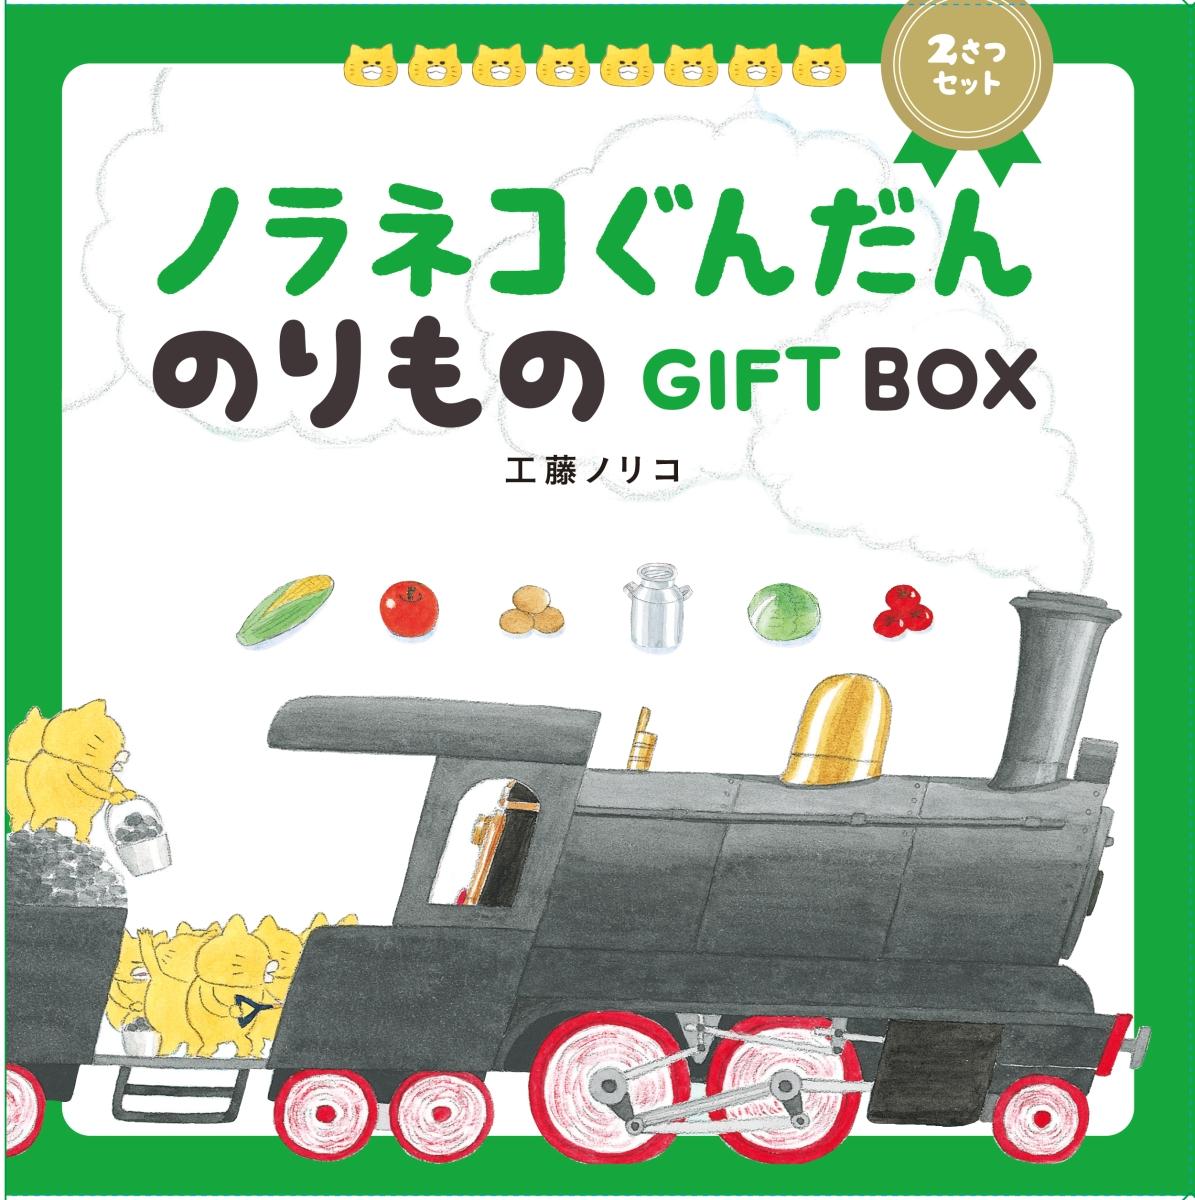 gift box2 giftbox negle Gallery